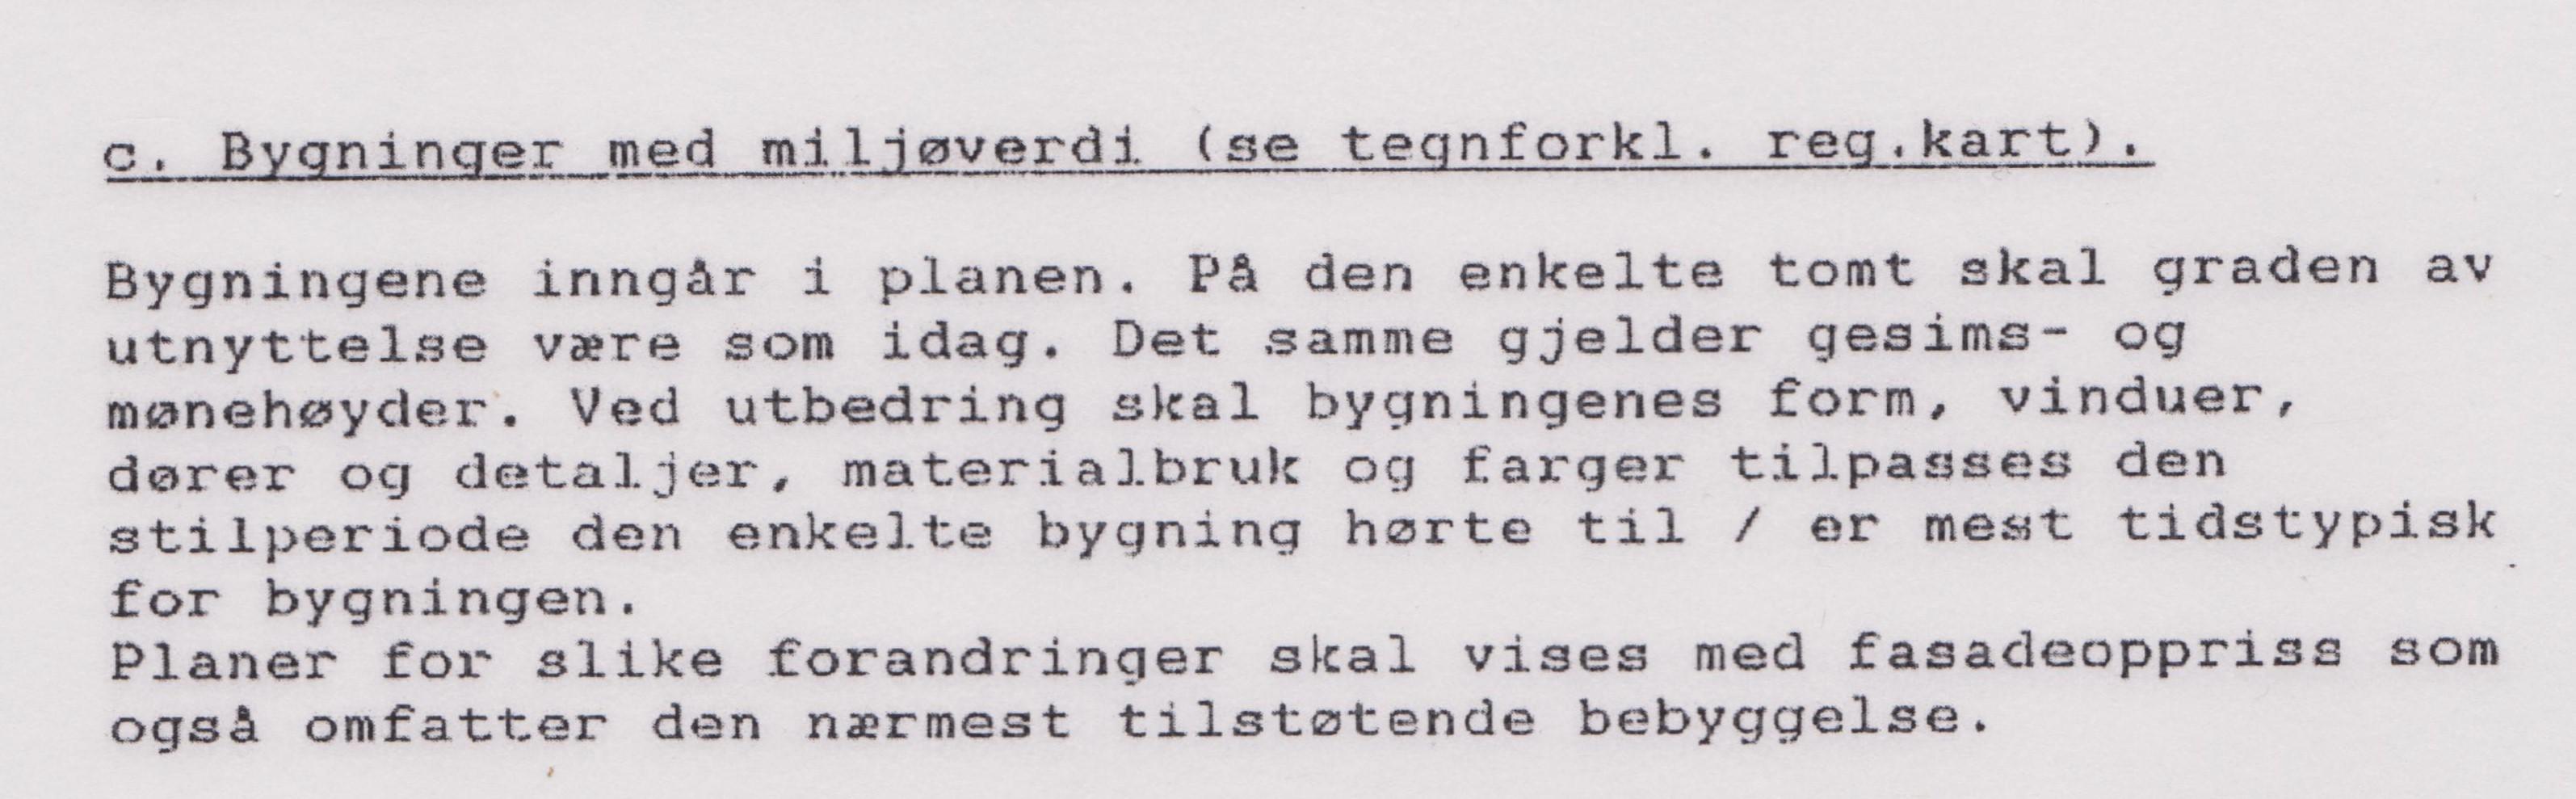 Detalj Bev.plan s.3 Paragraf 5. c)